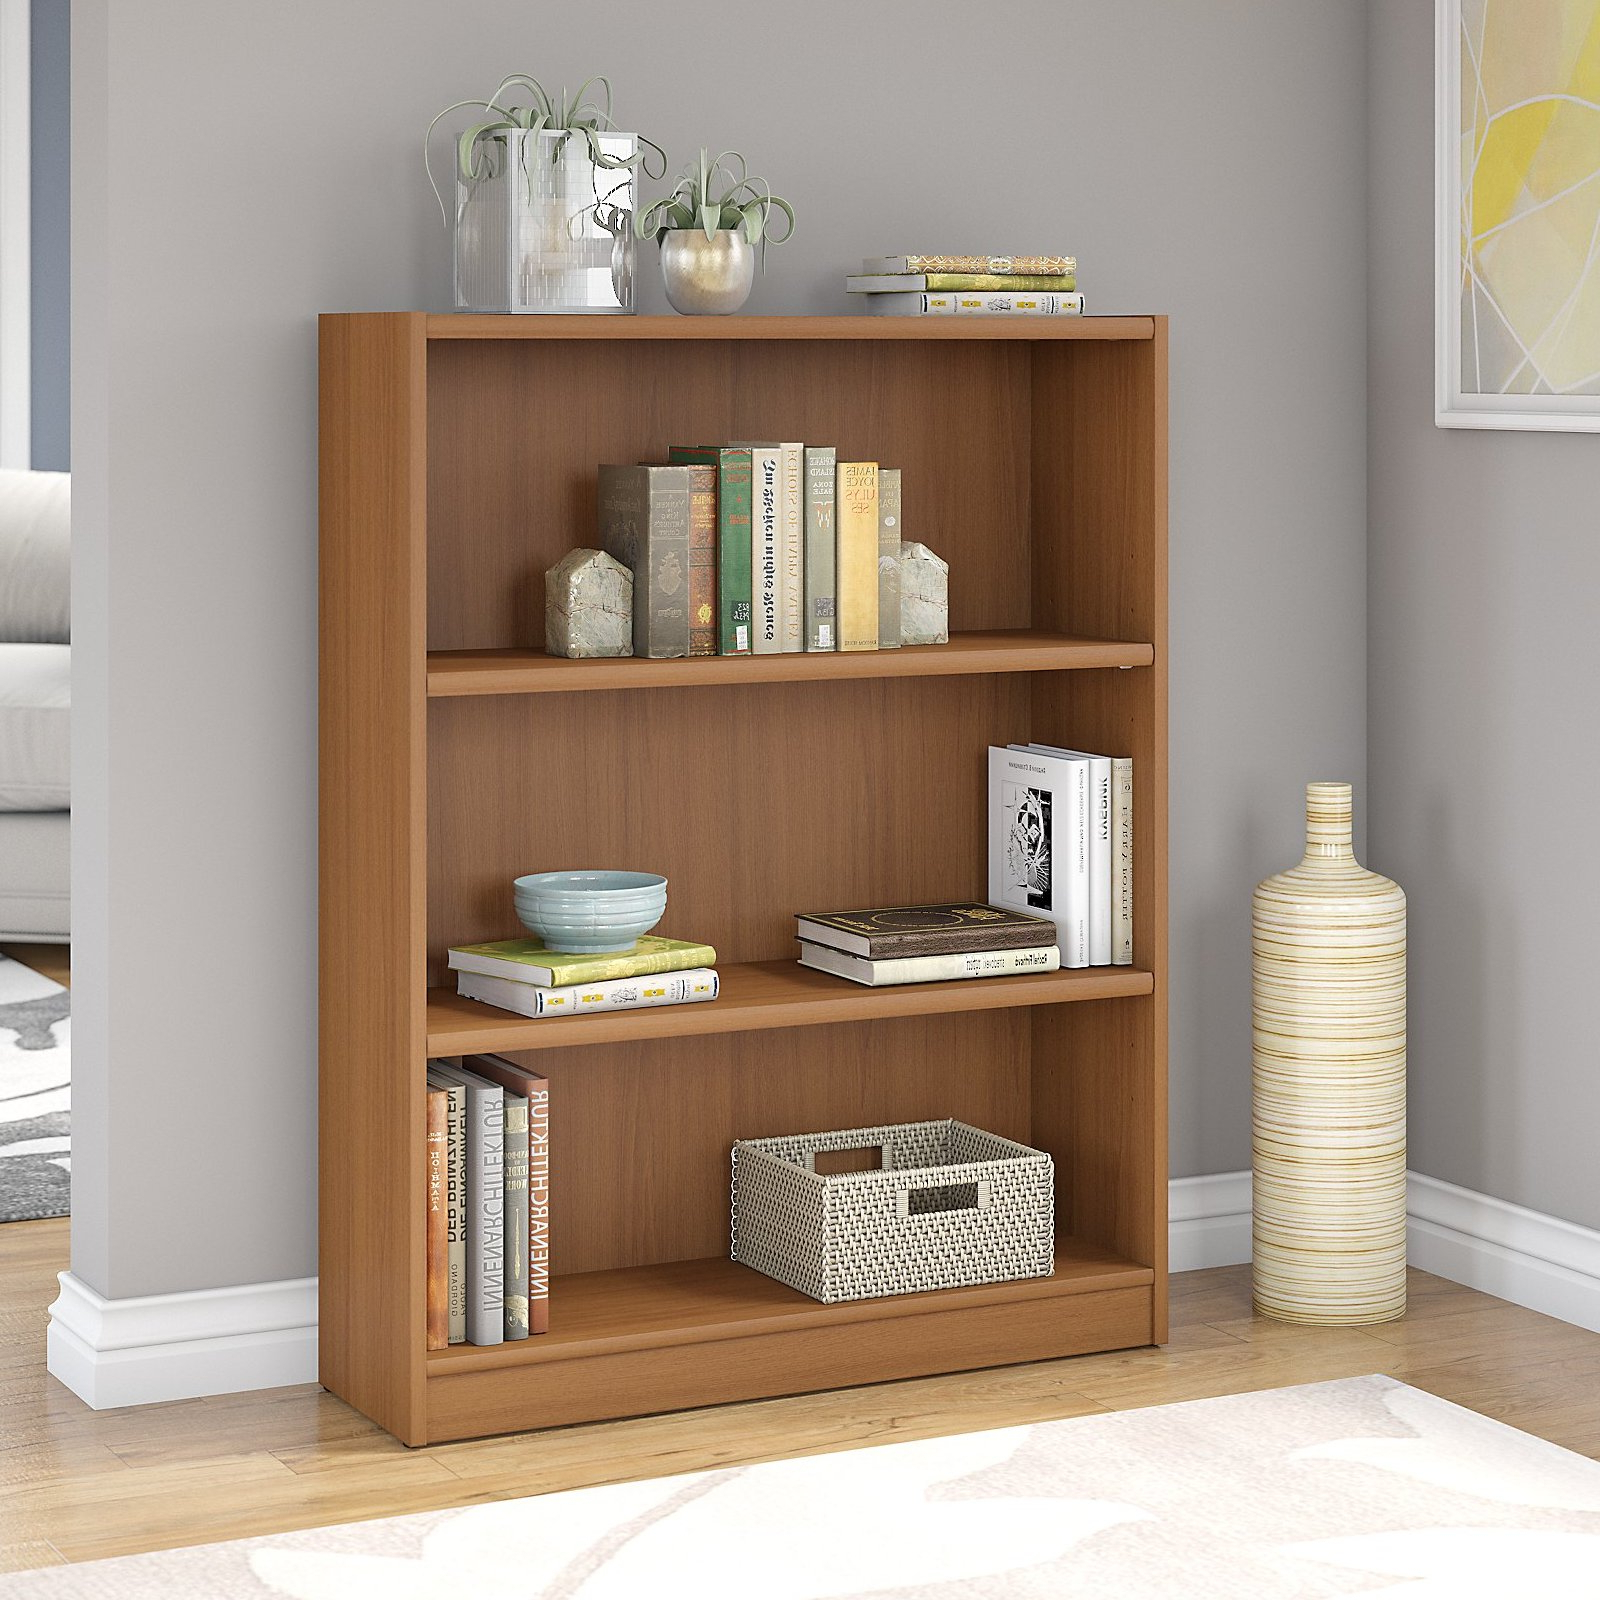 Kirkbride Standard Bookcases Throughout 2020 Ebern Designs Kirkbride Standard Bookcase (View 8 of 20)